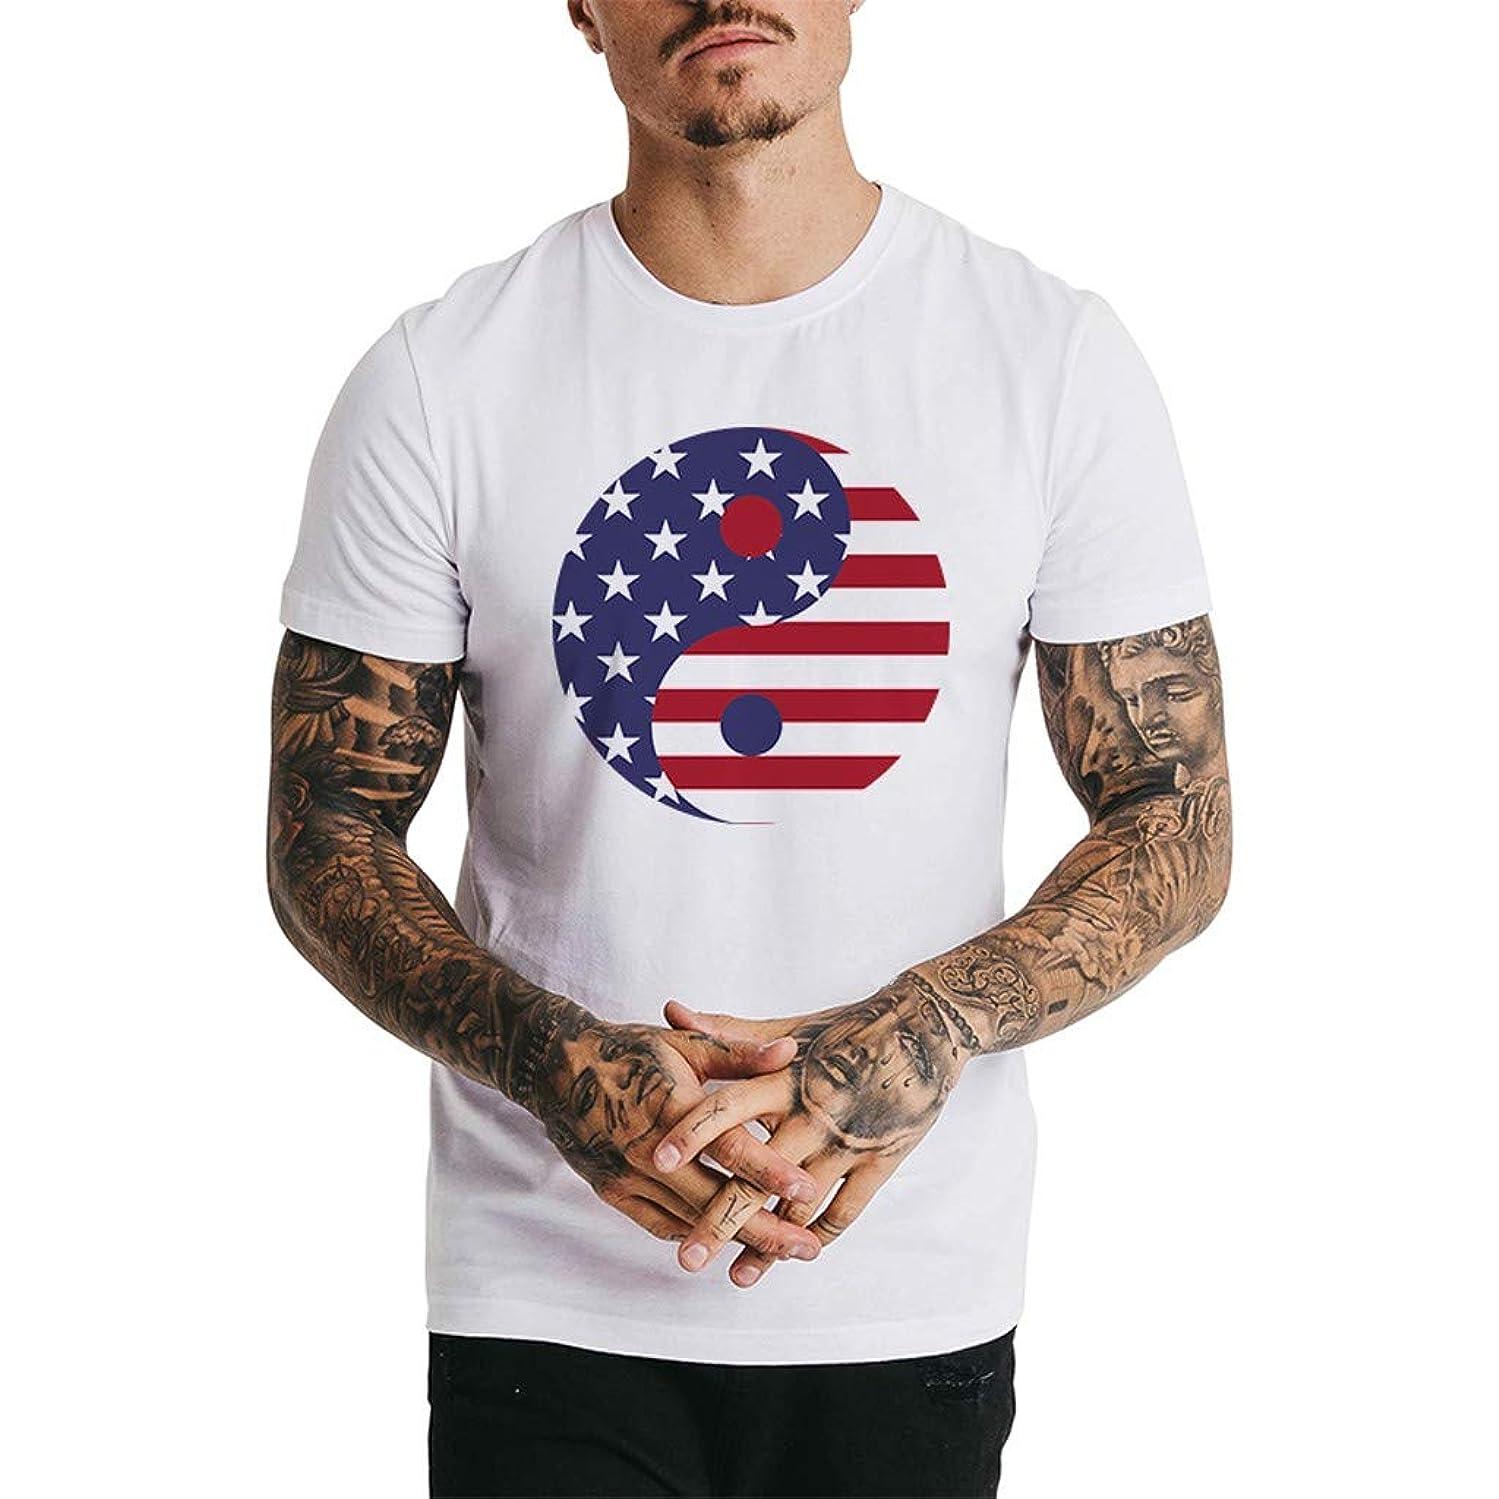 Men's USA American Tee Respctful?Men Patriotic Printed Short Sleeve Casual Cotton Tees Shirt for July 4